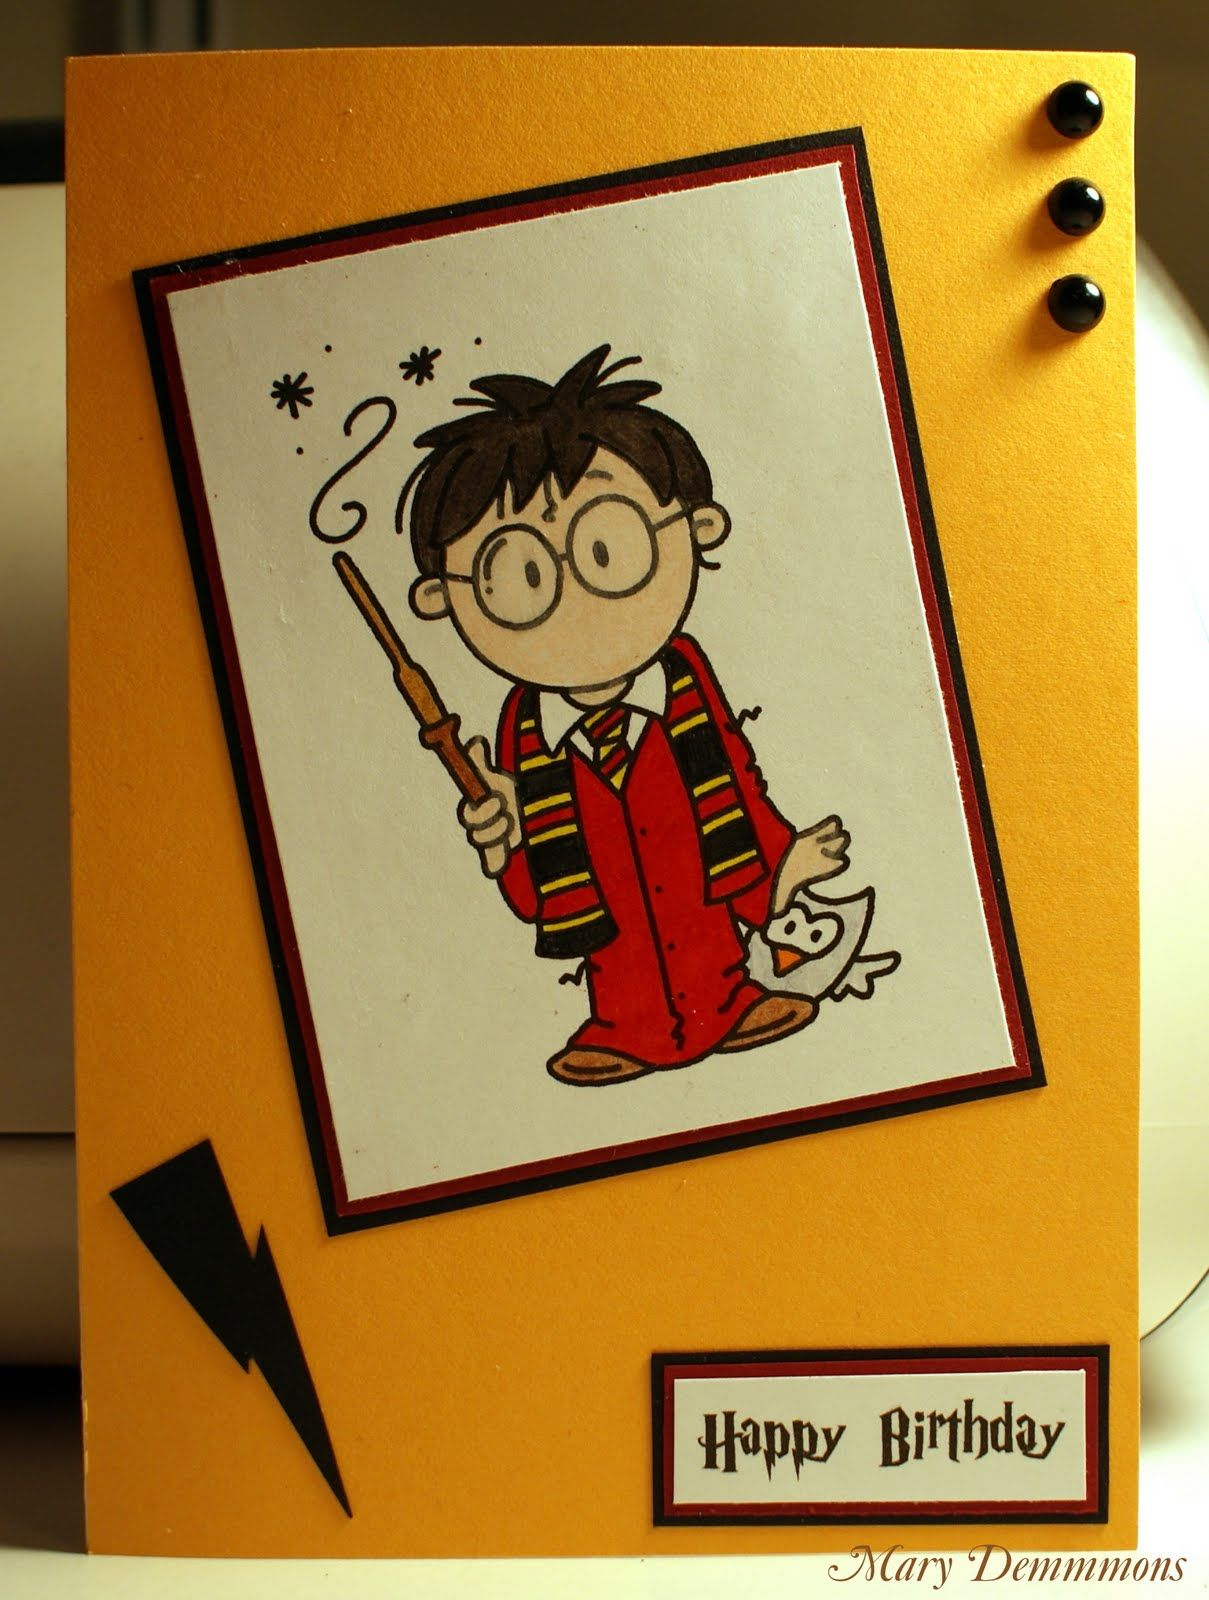 Harry Potter Birthday Card Harry Potter Birthday Cards Harry Potter Cards Harry Potter Birthday